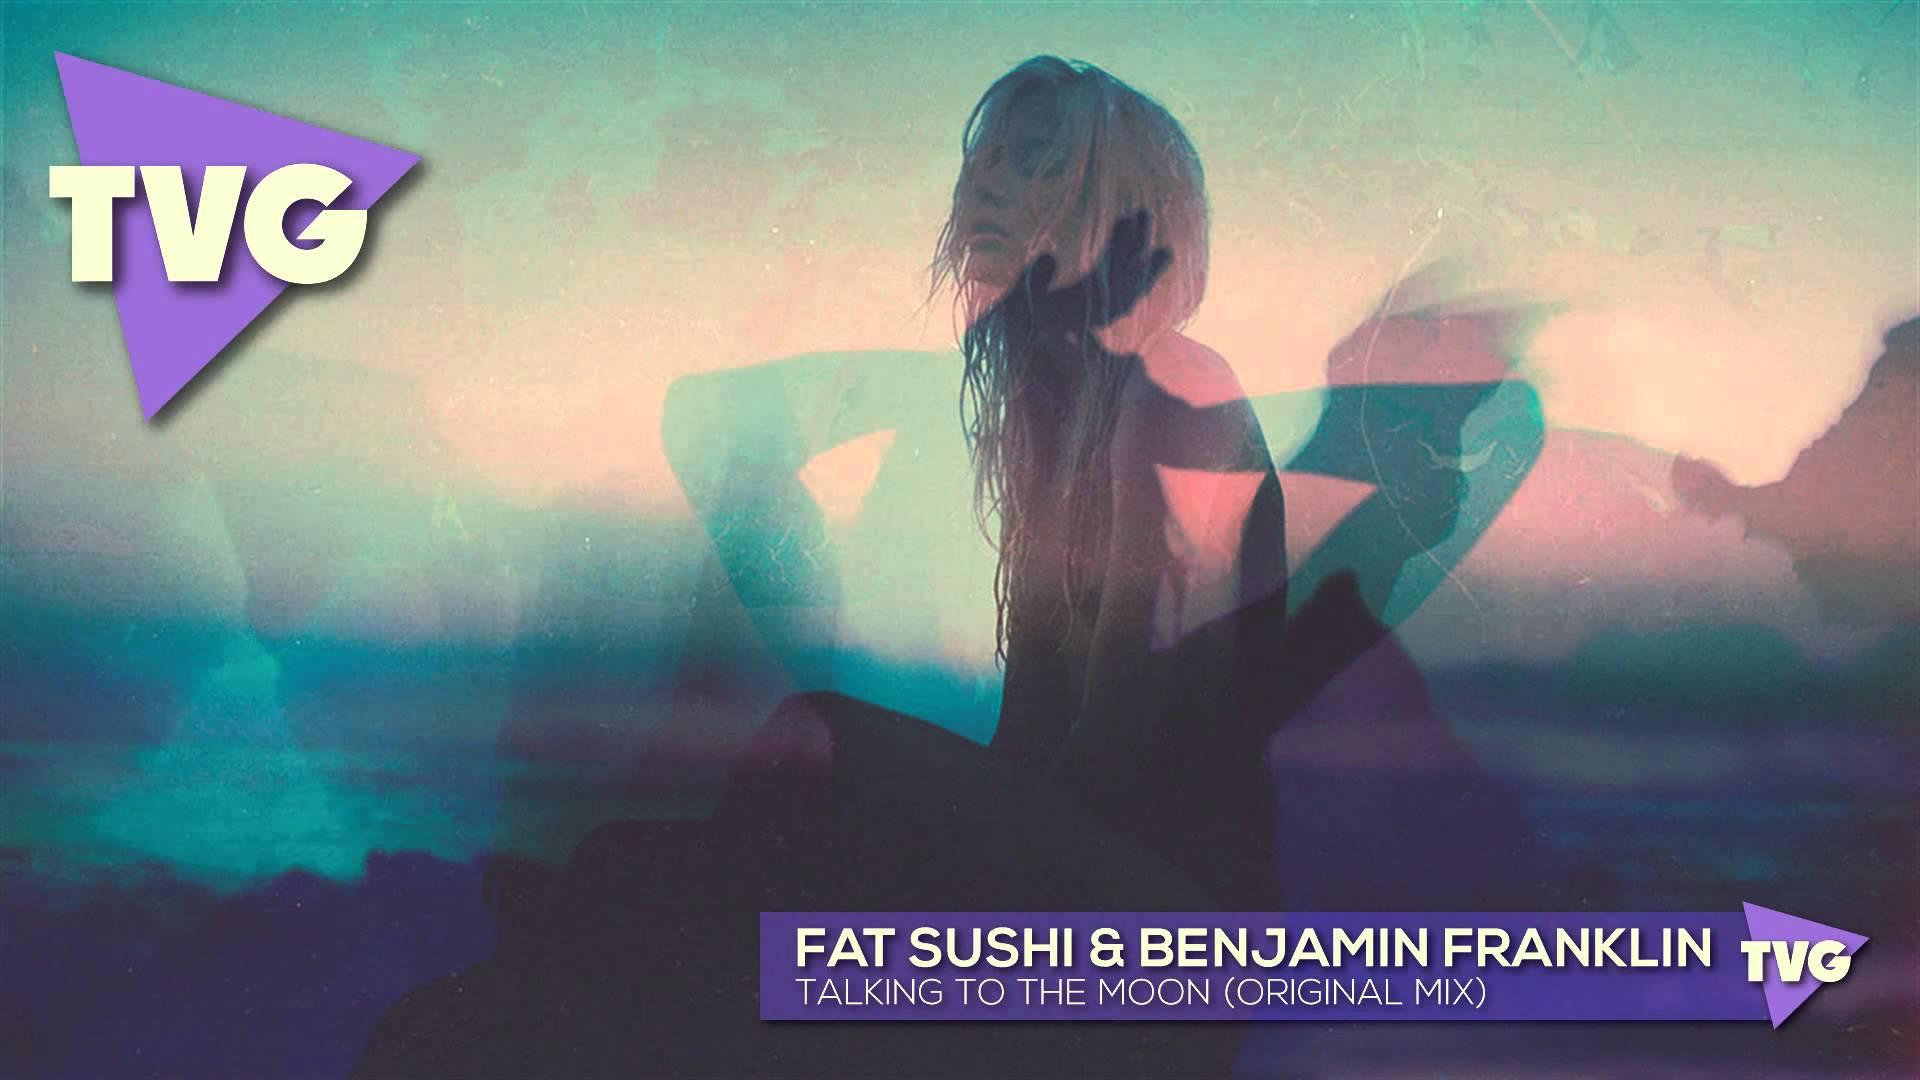 Fat Sushi & Benjamin Franklin - Talking To The Moon (Original Mix)